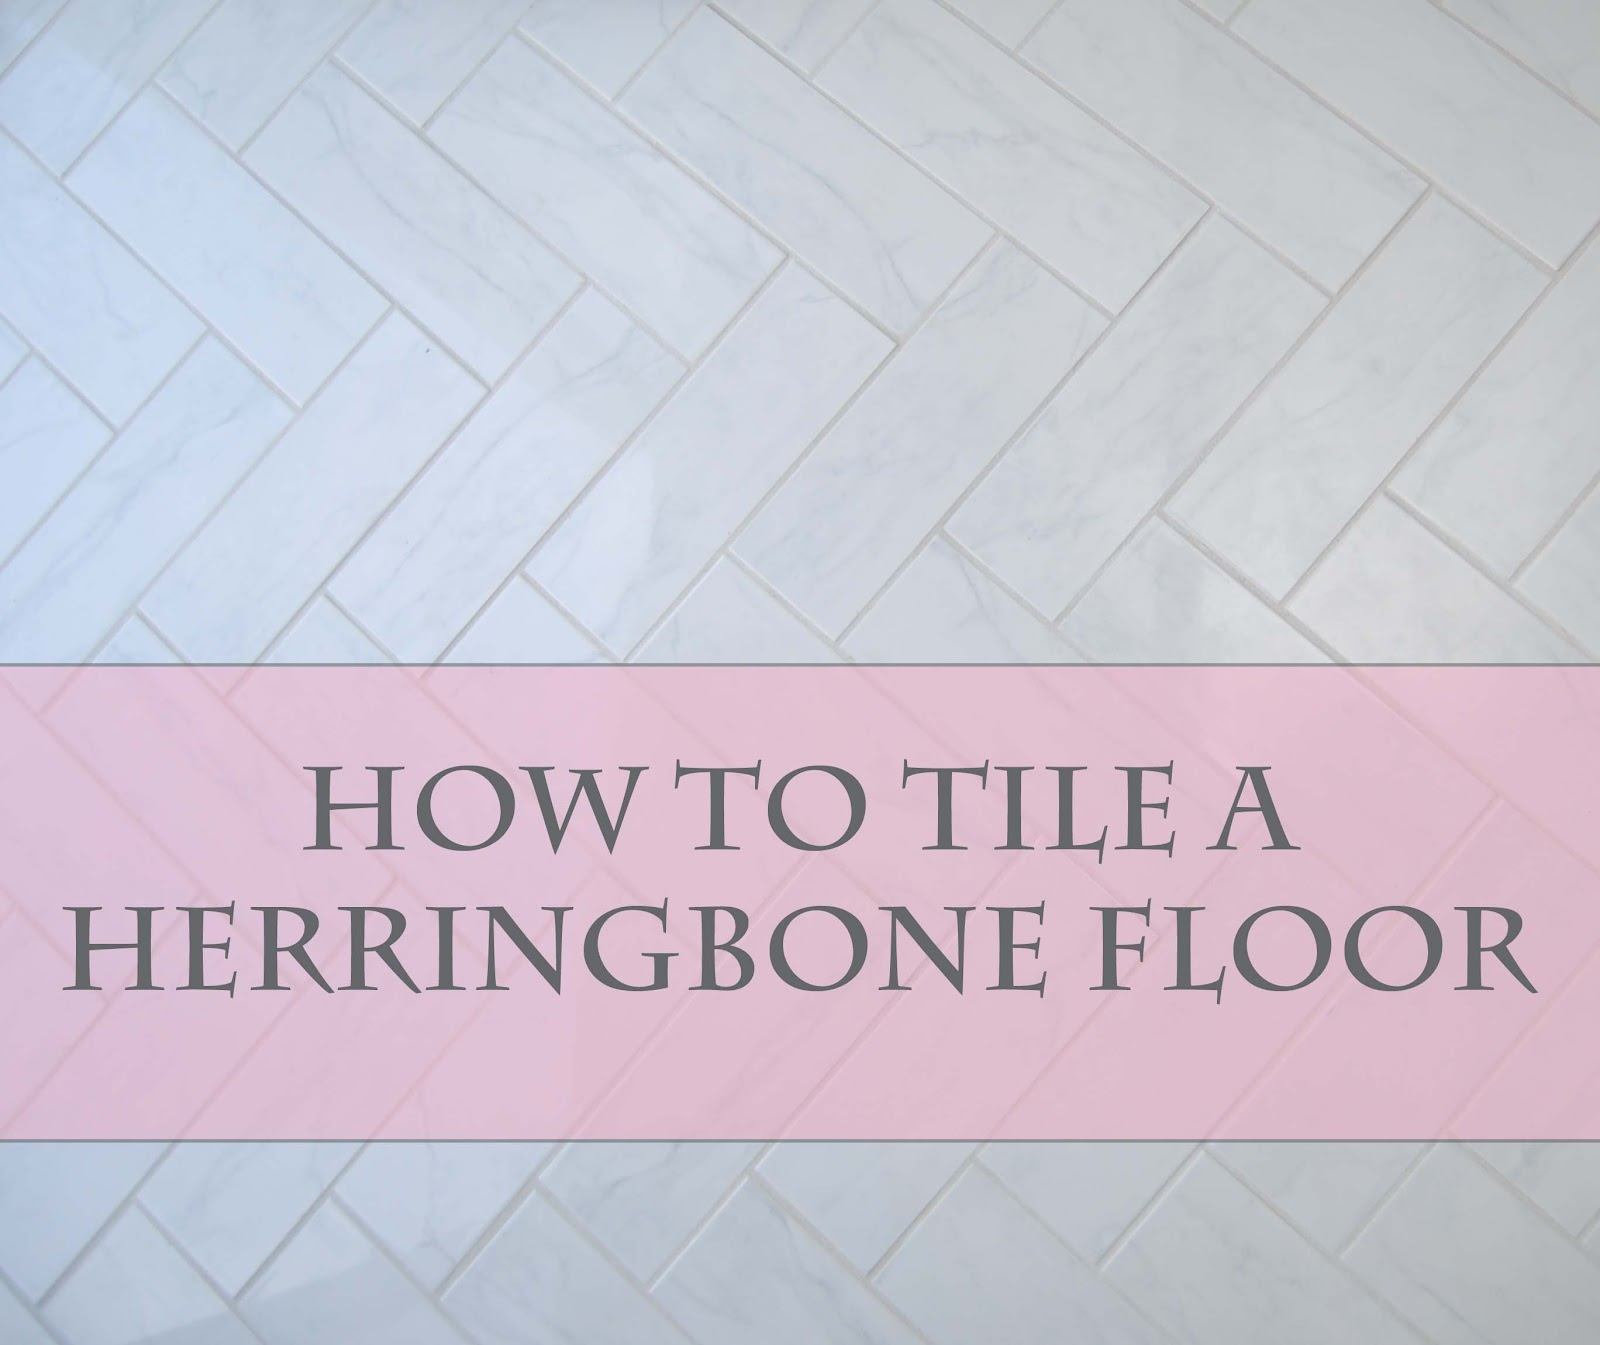 How to tile a herringbone floor part i